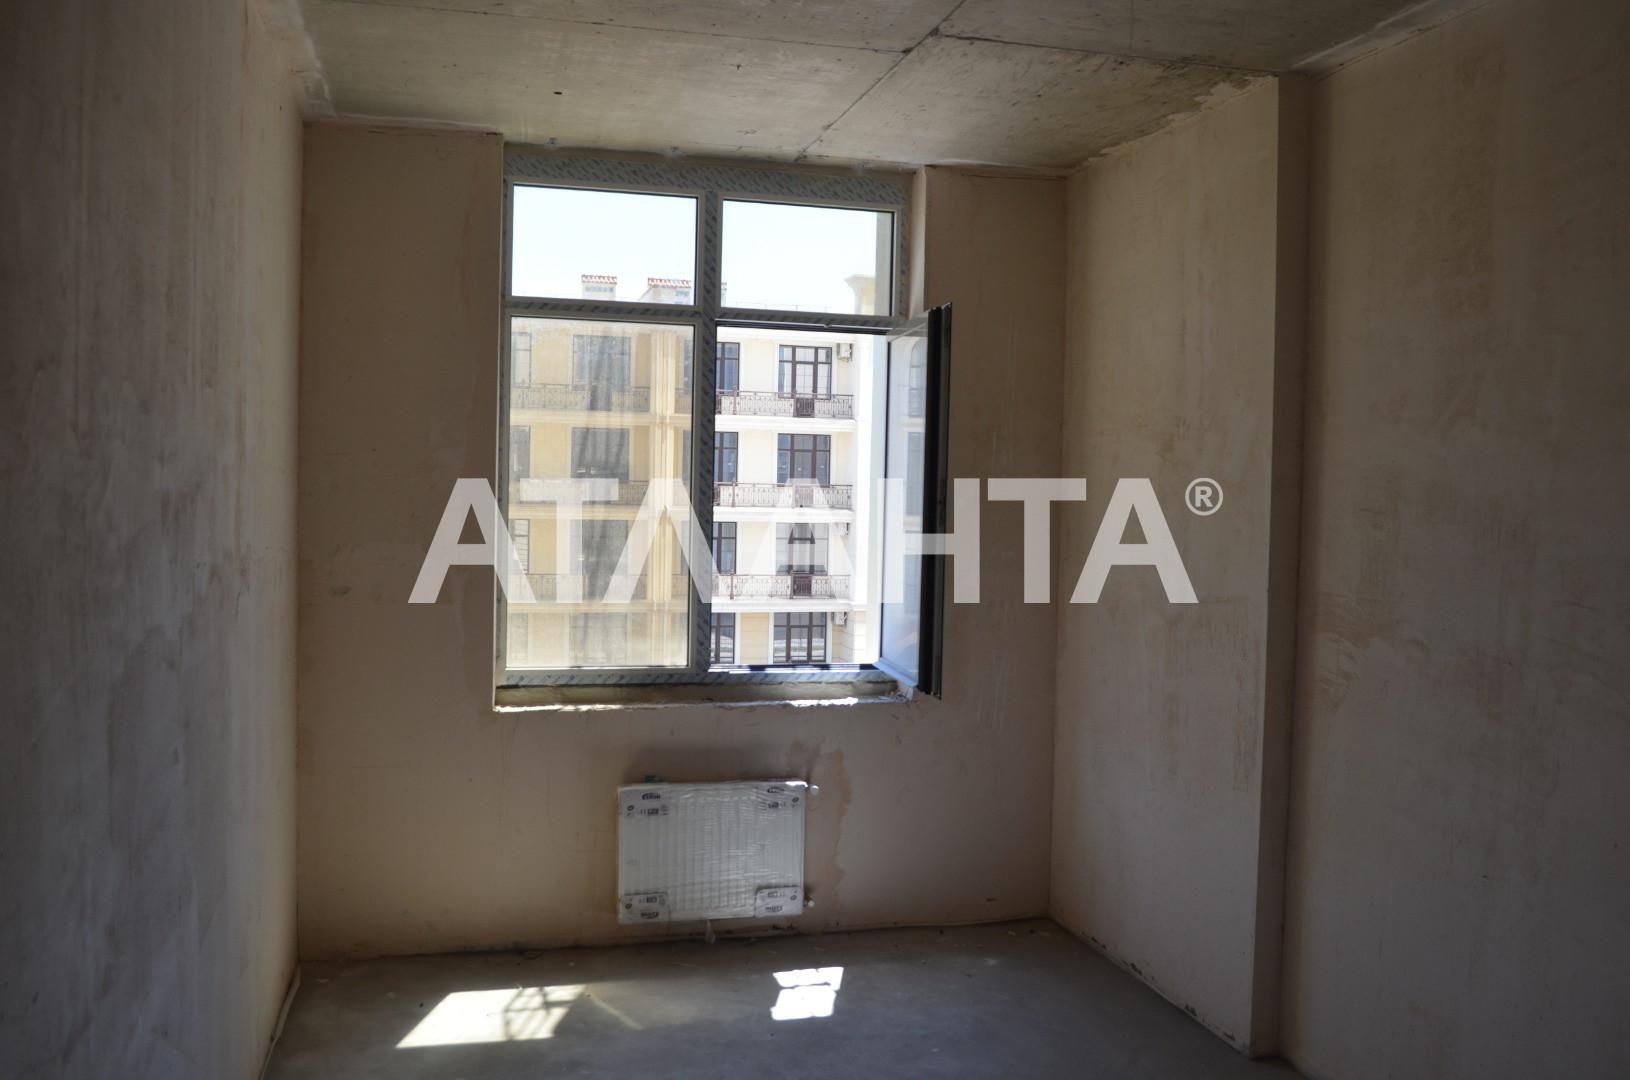 Продается 1-комнатная Квартира на ул. Французский Бул. (Пролетарский Бул.) — 49 900 у.е. (фото №2)